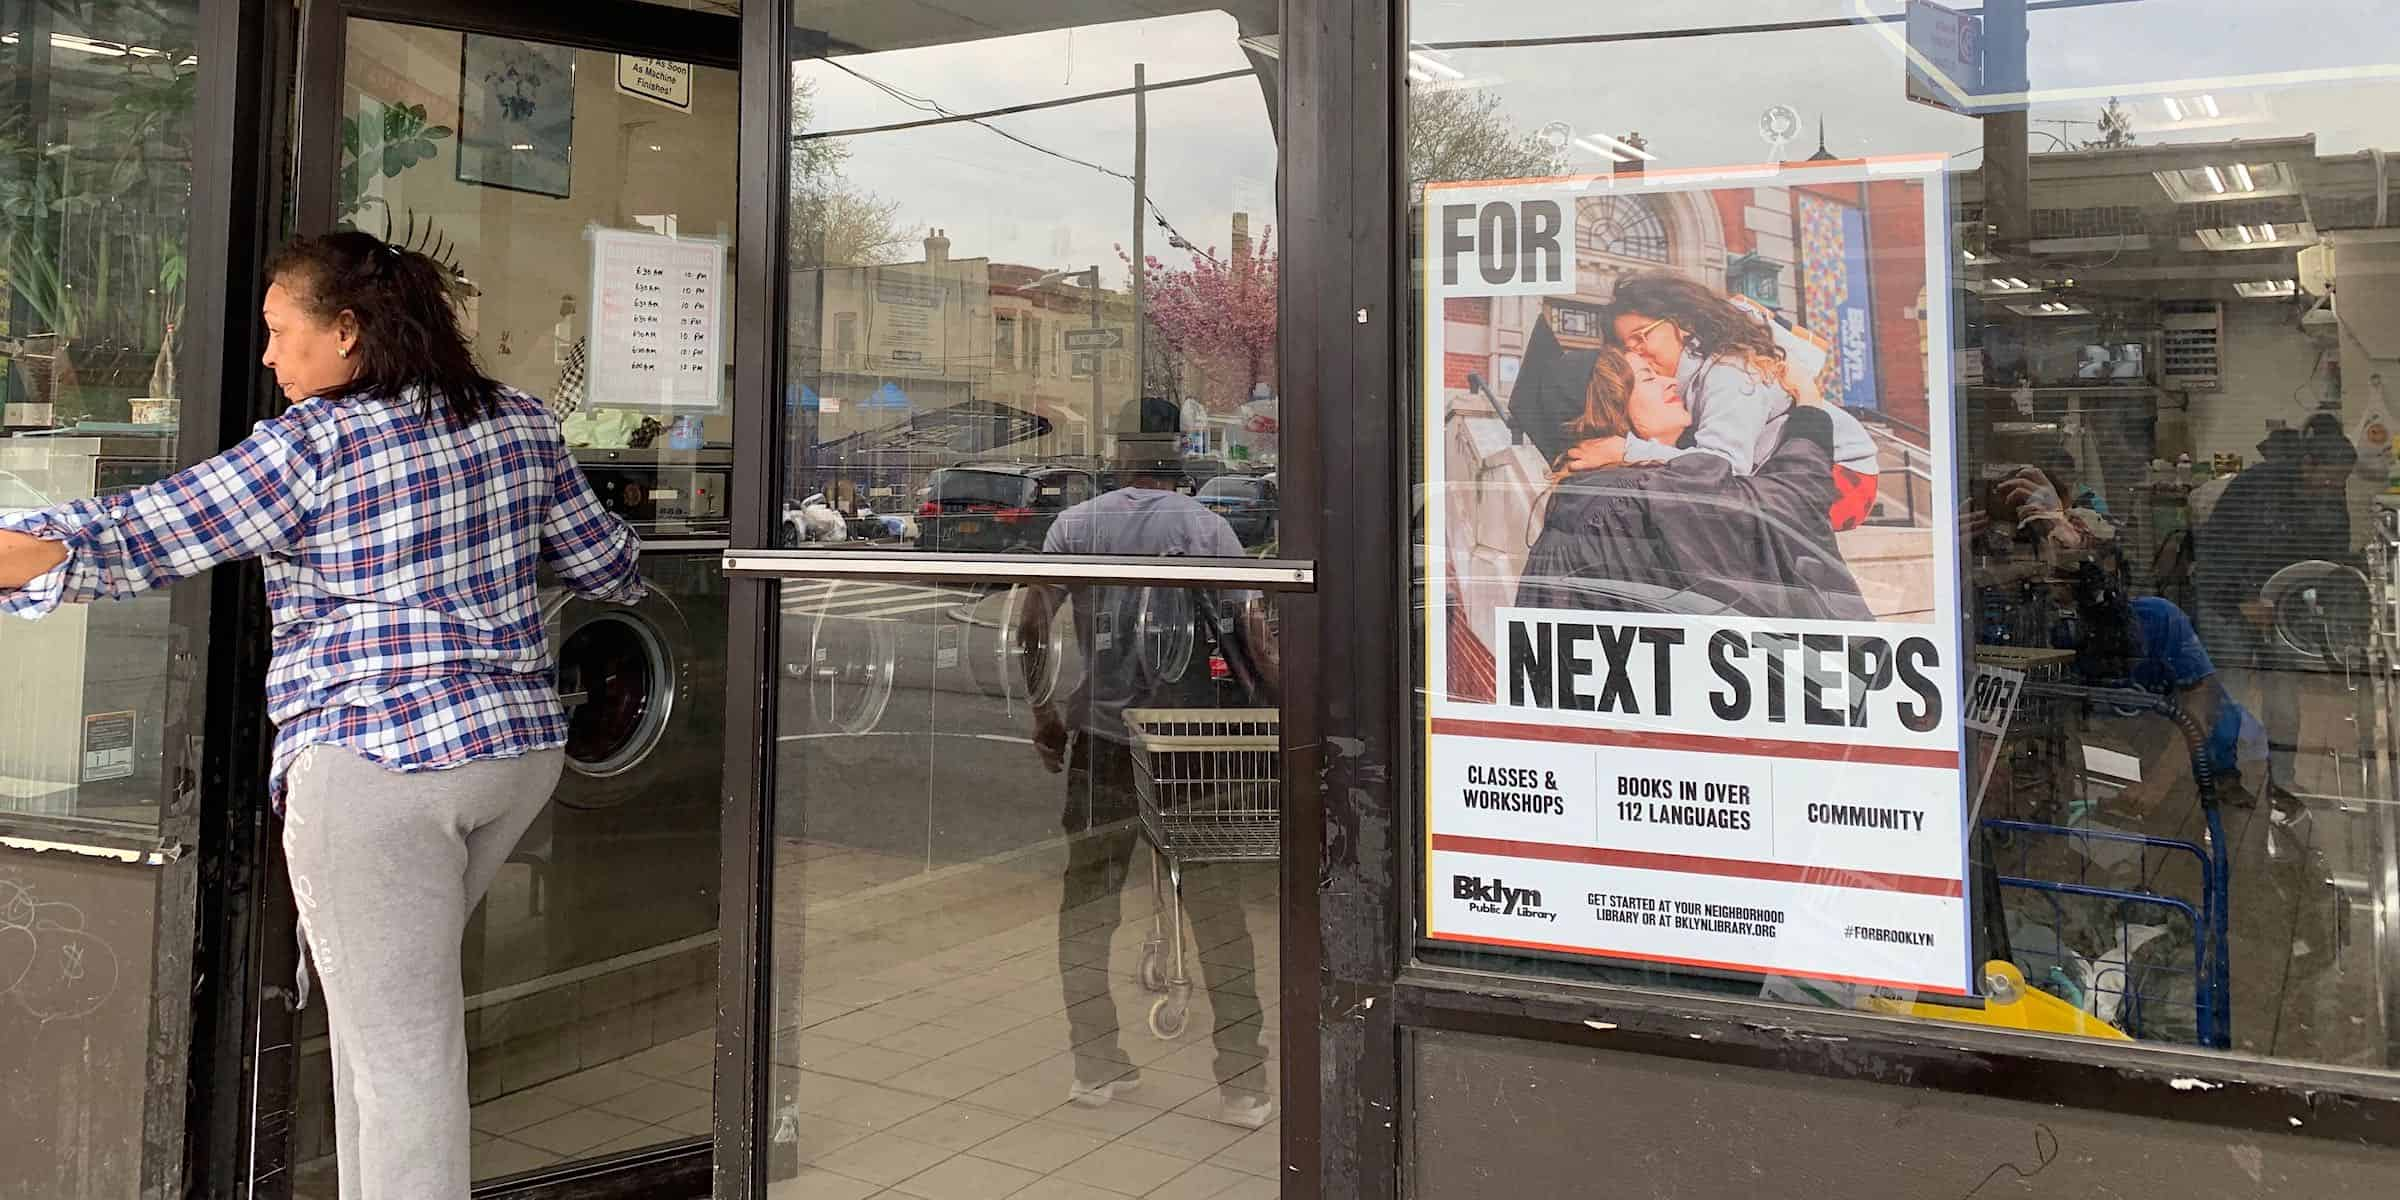 Laundromat 1-Sheet Poster Spanish Advertising Company - Brooklyn, New York City